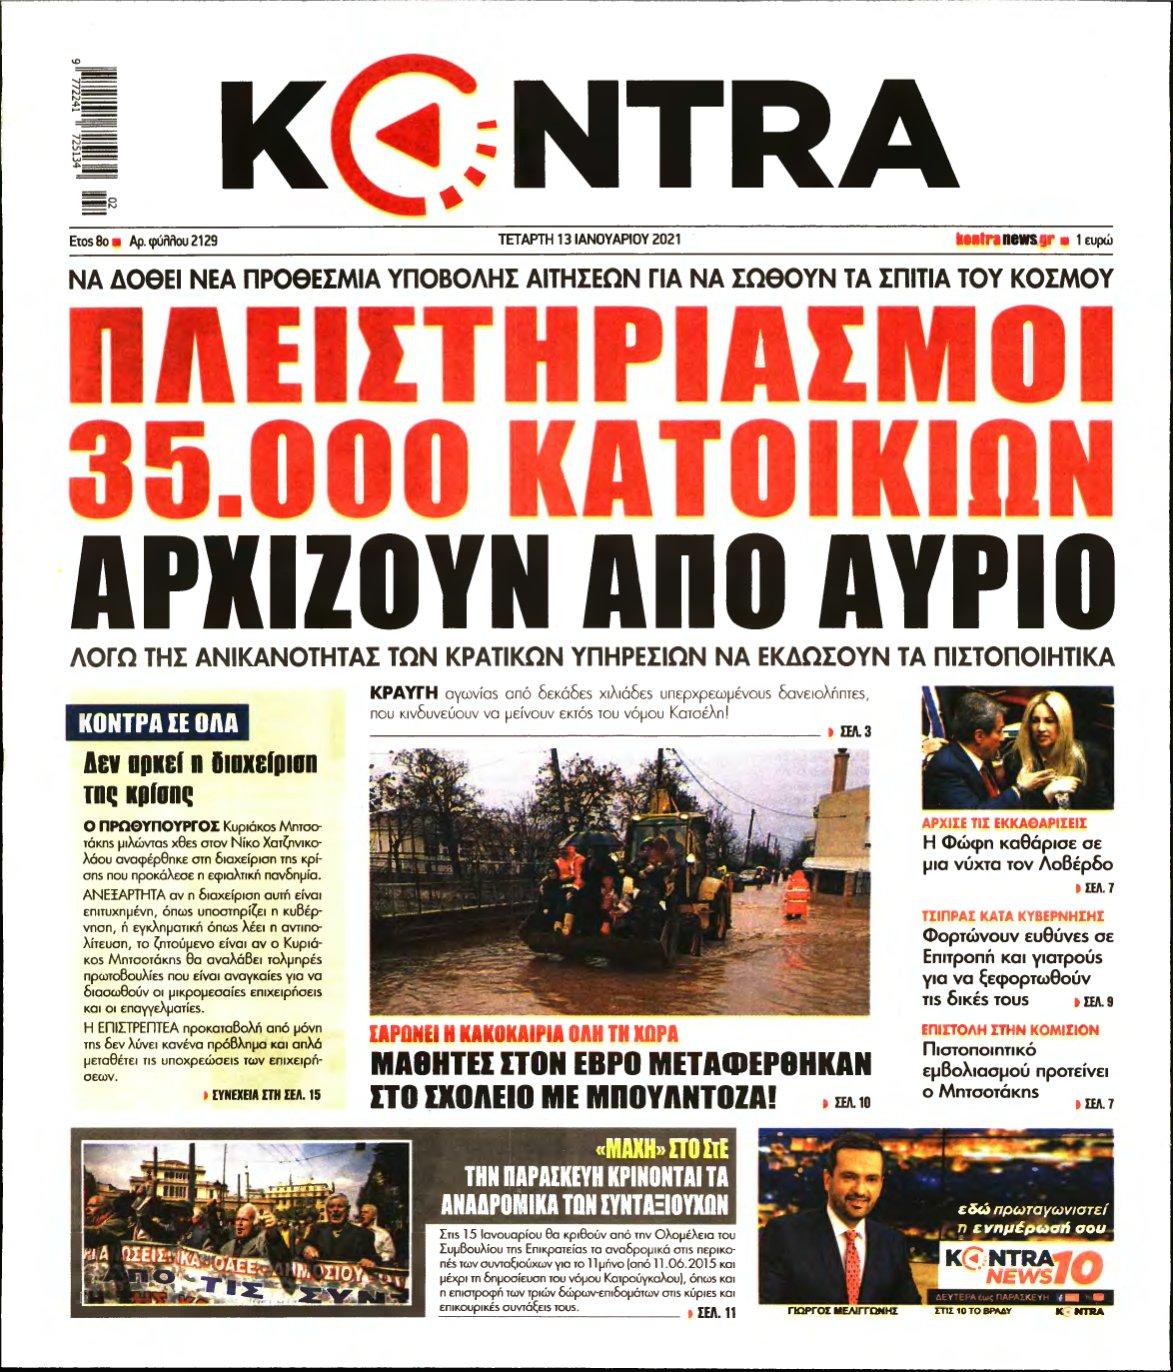 KONTRA NEWS – 13/01/2021